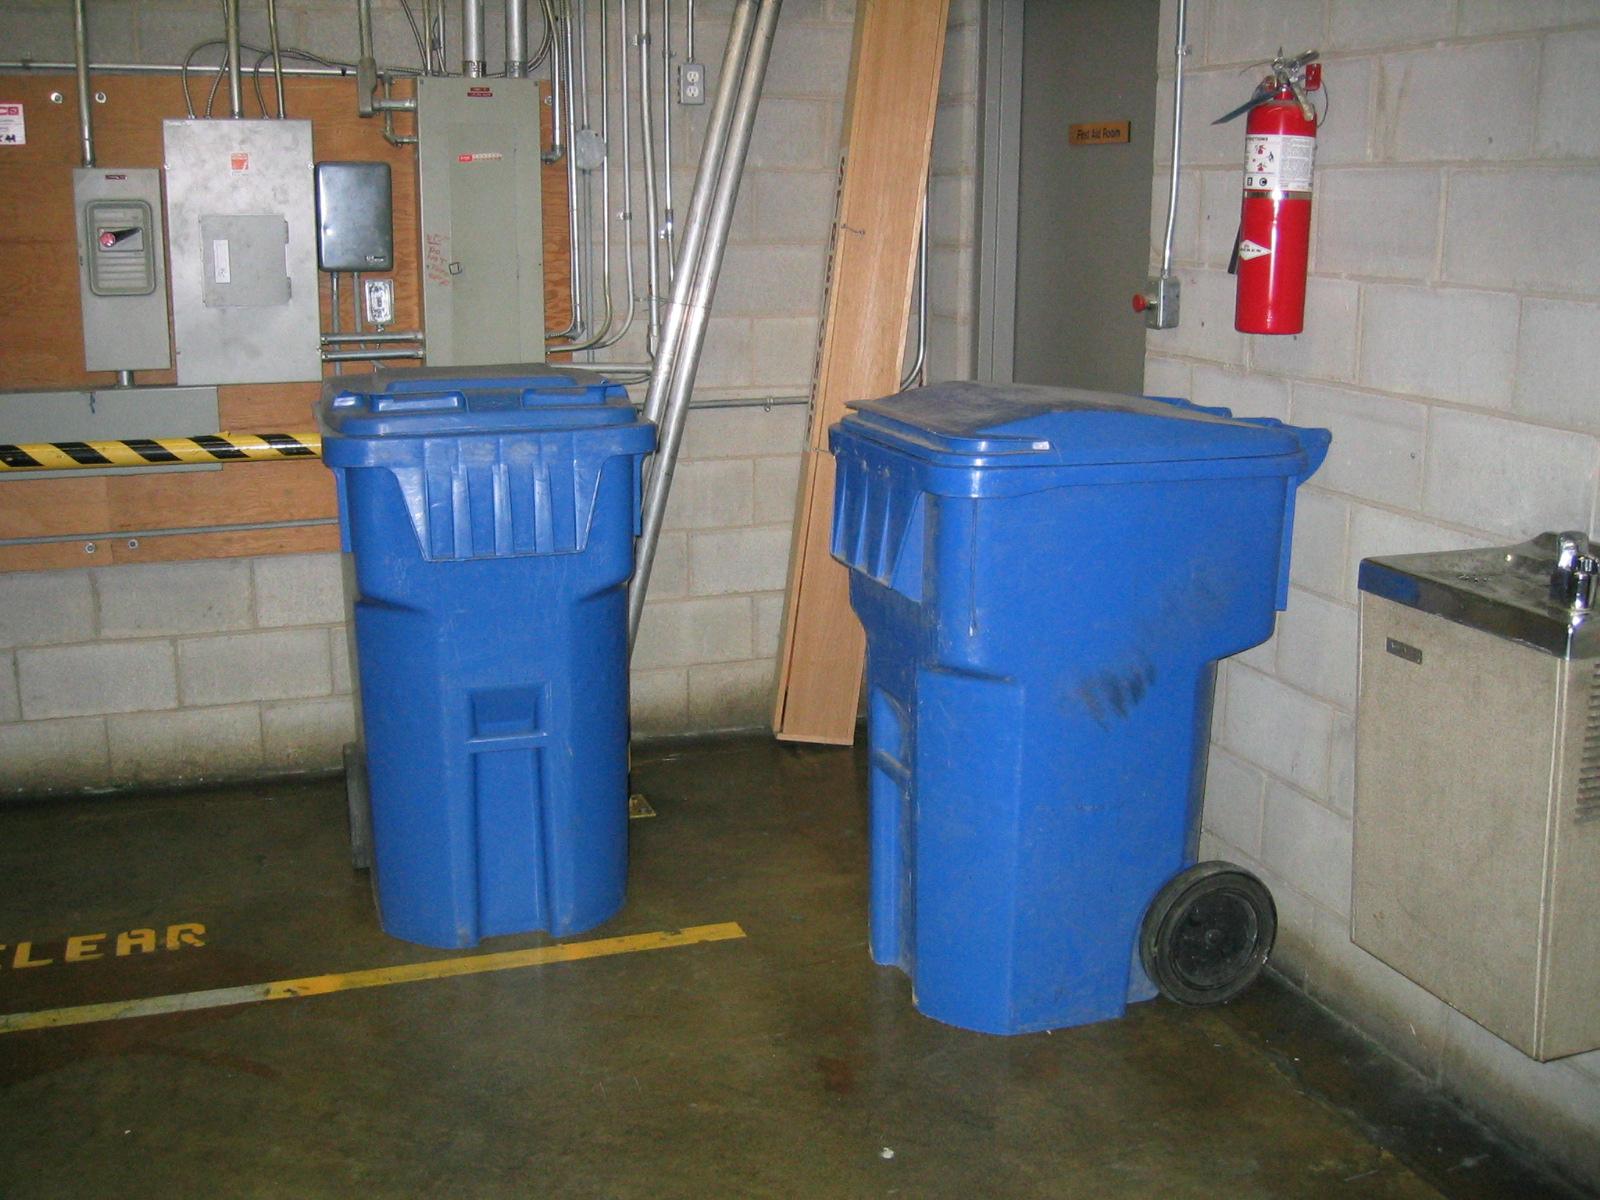 Paper Recycling Bins 014.jpg